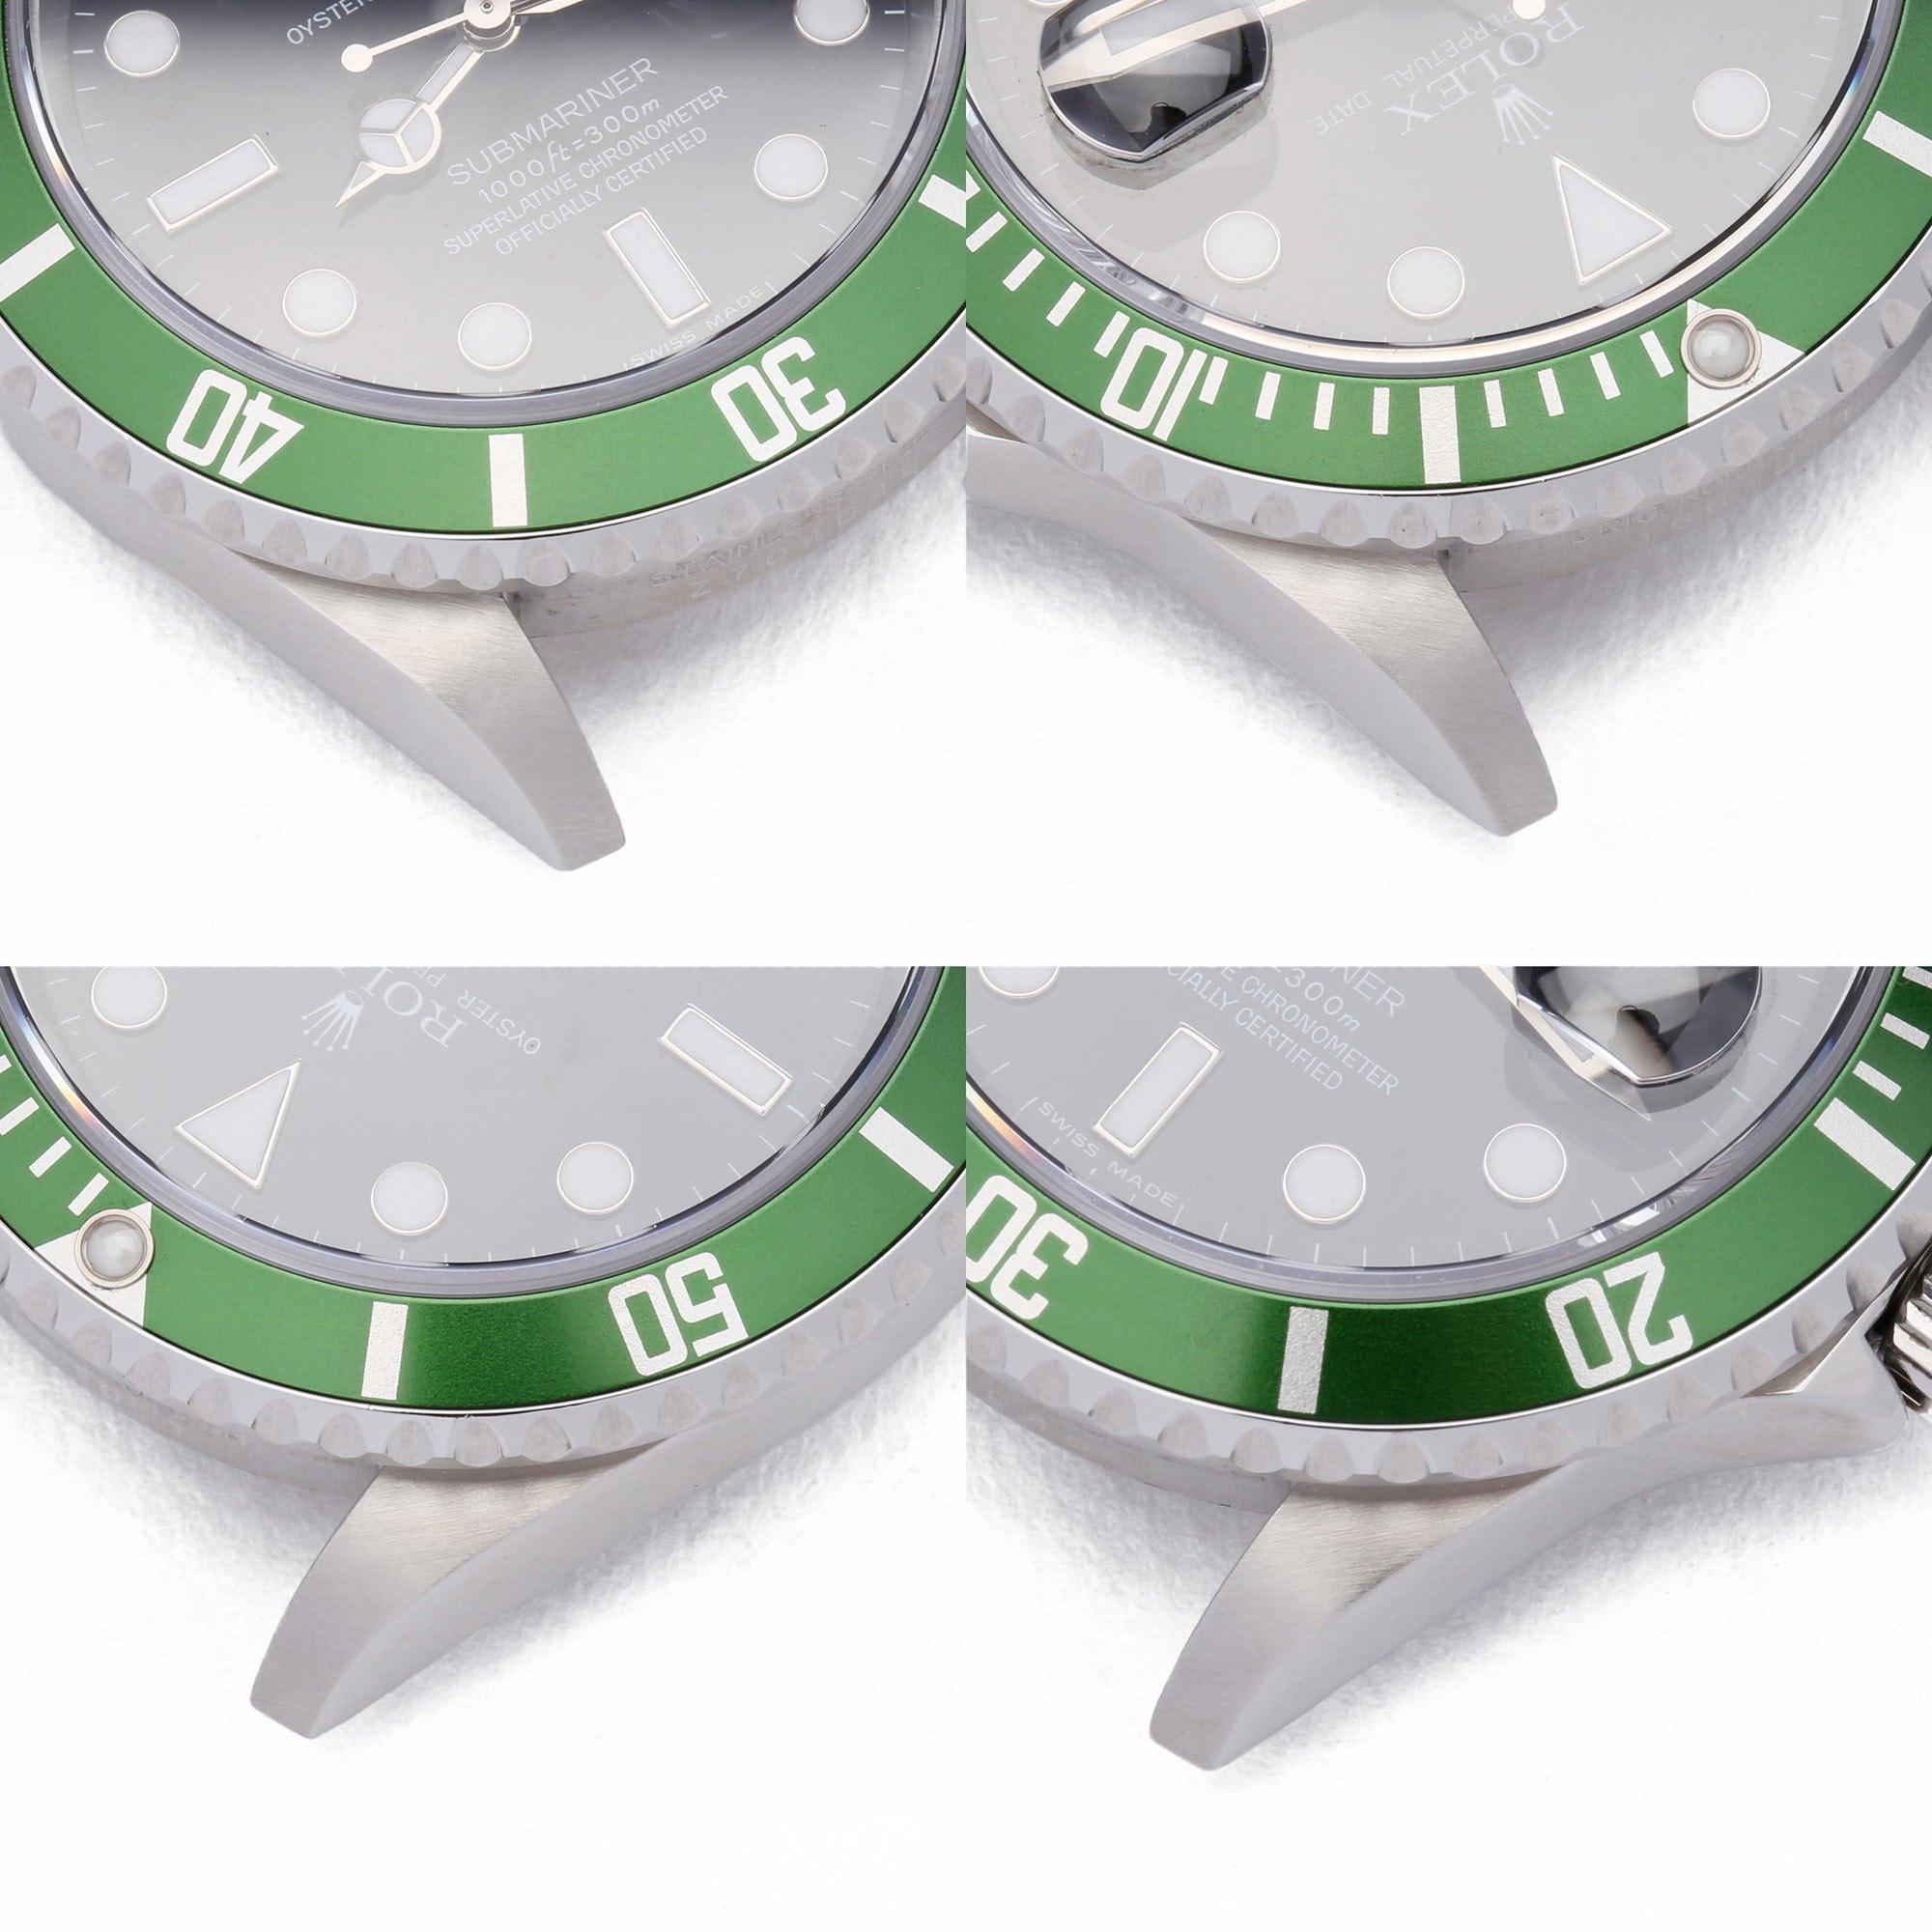 Rolex Submariner Date Kermit Roestvrij Staal 16610LV